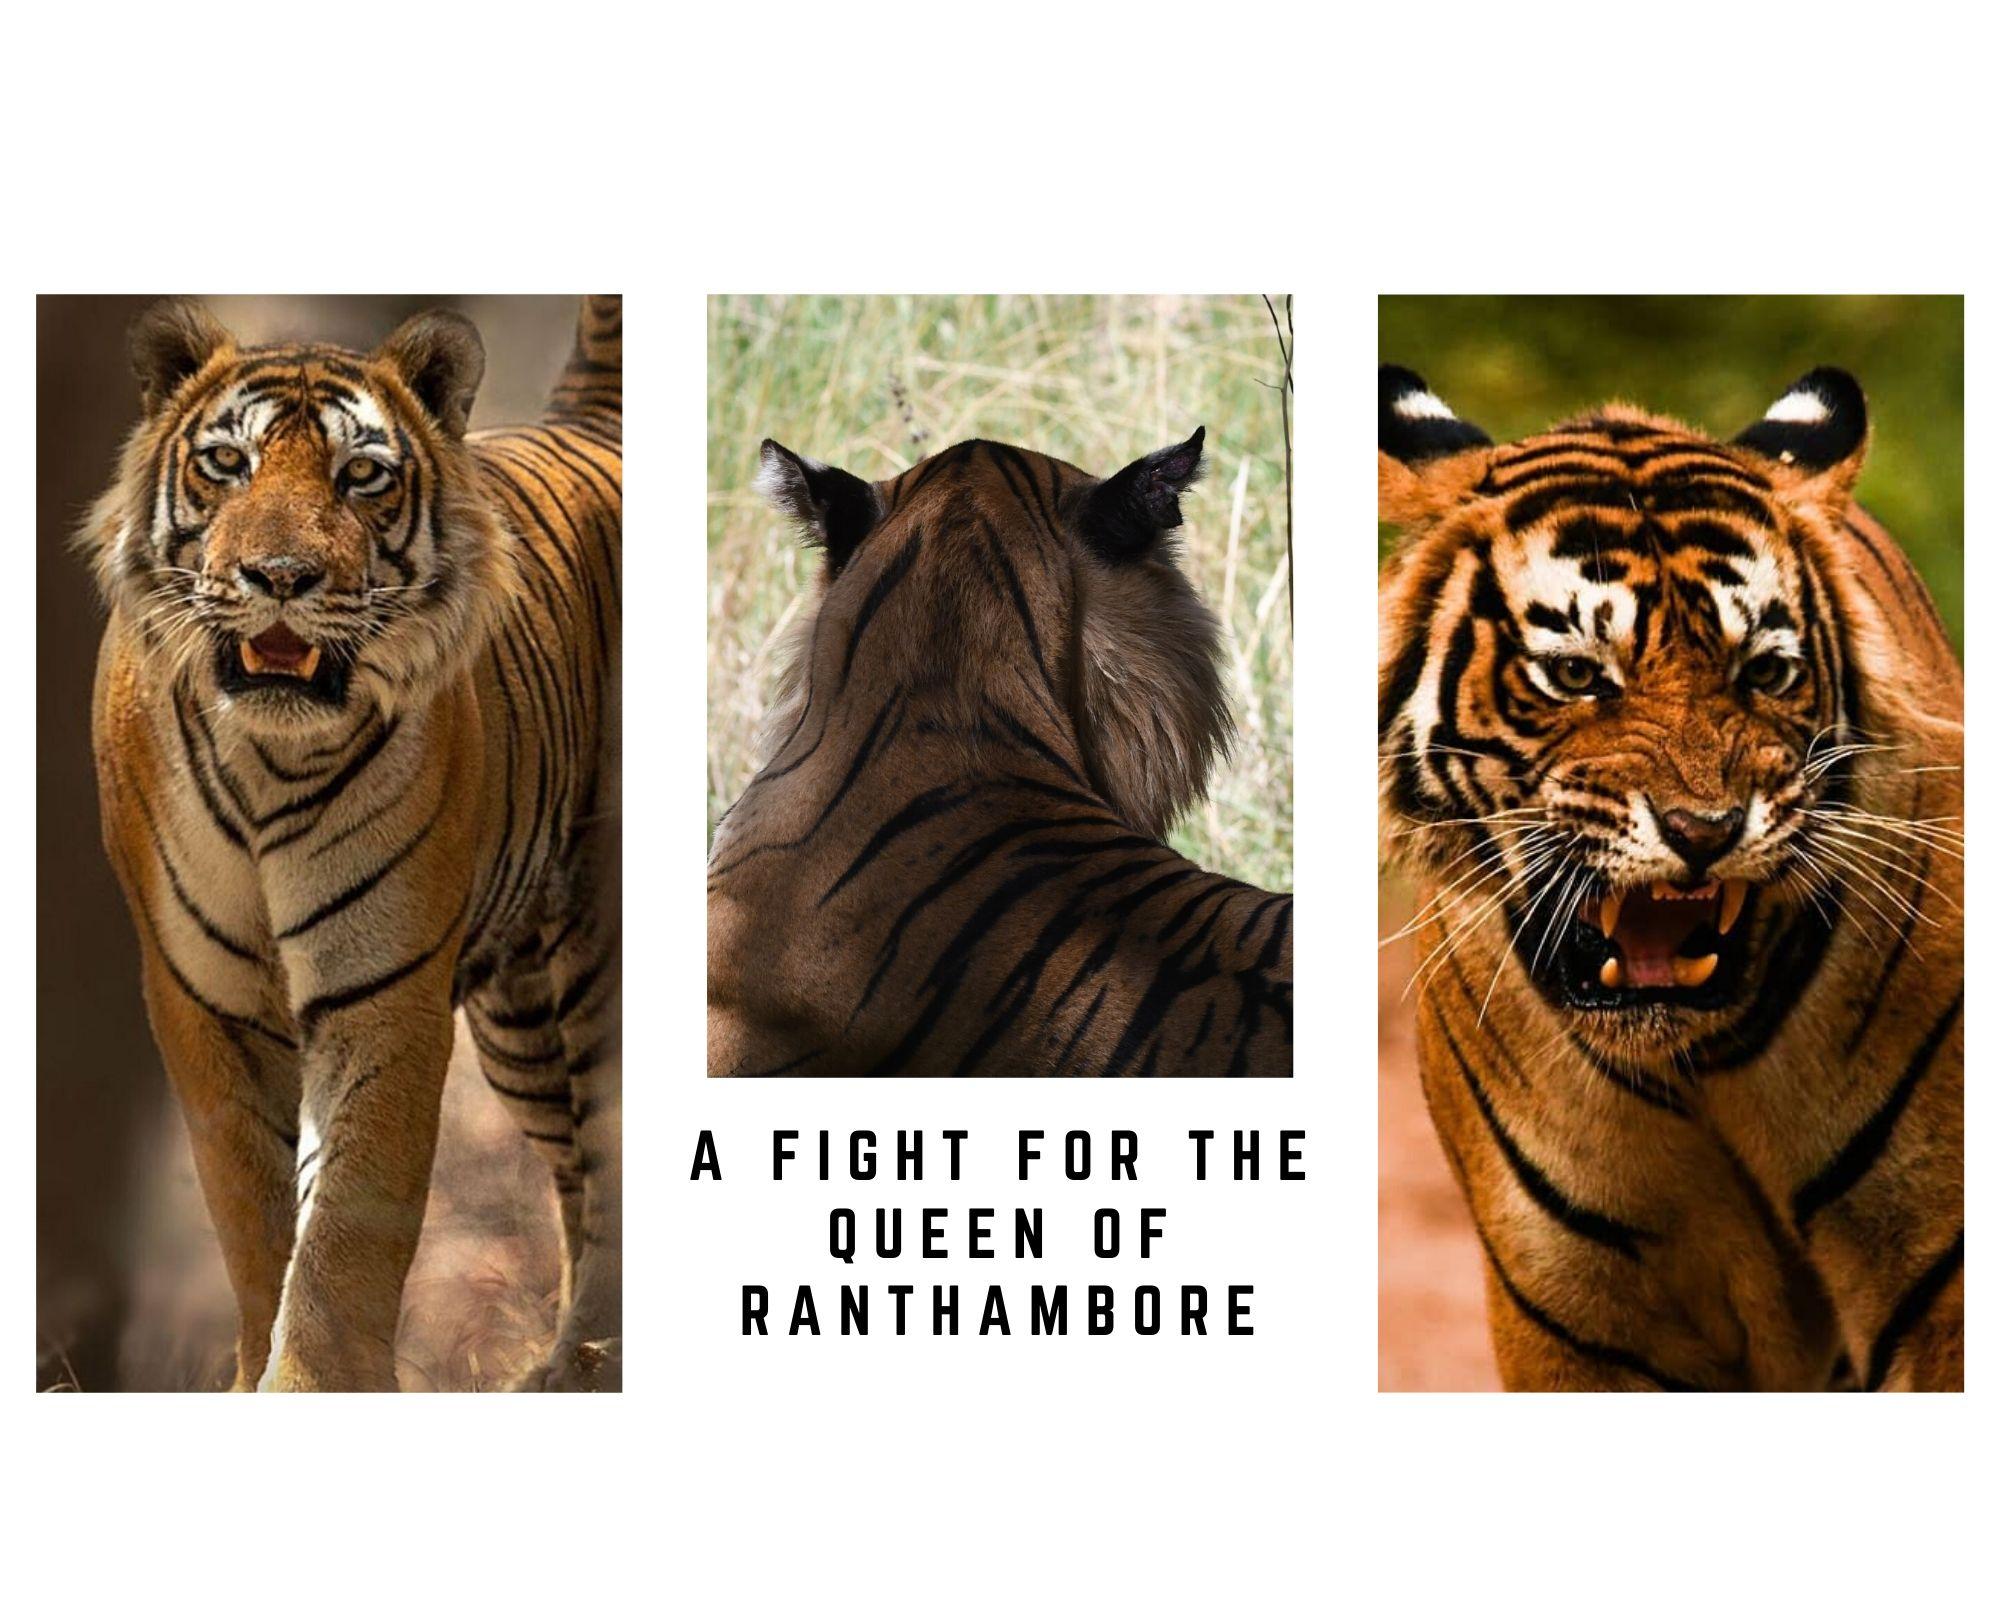 rANTHAMBORE RECENT TIGER SIGHTINGS